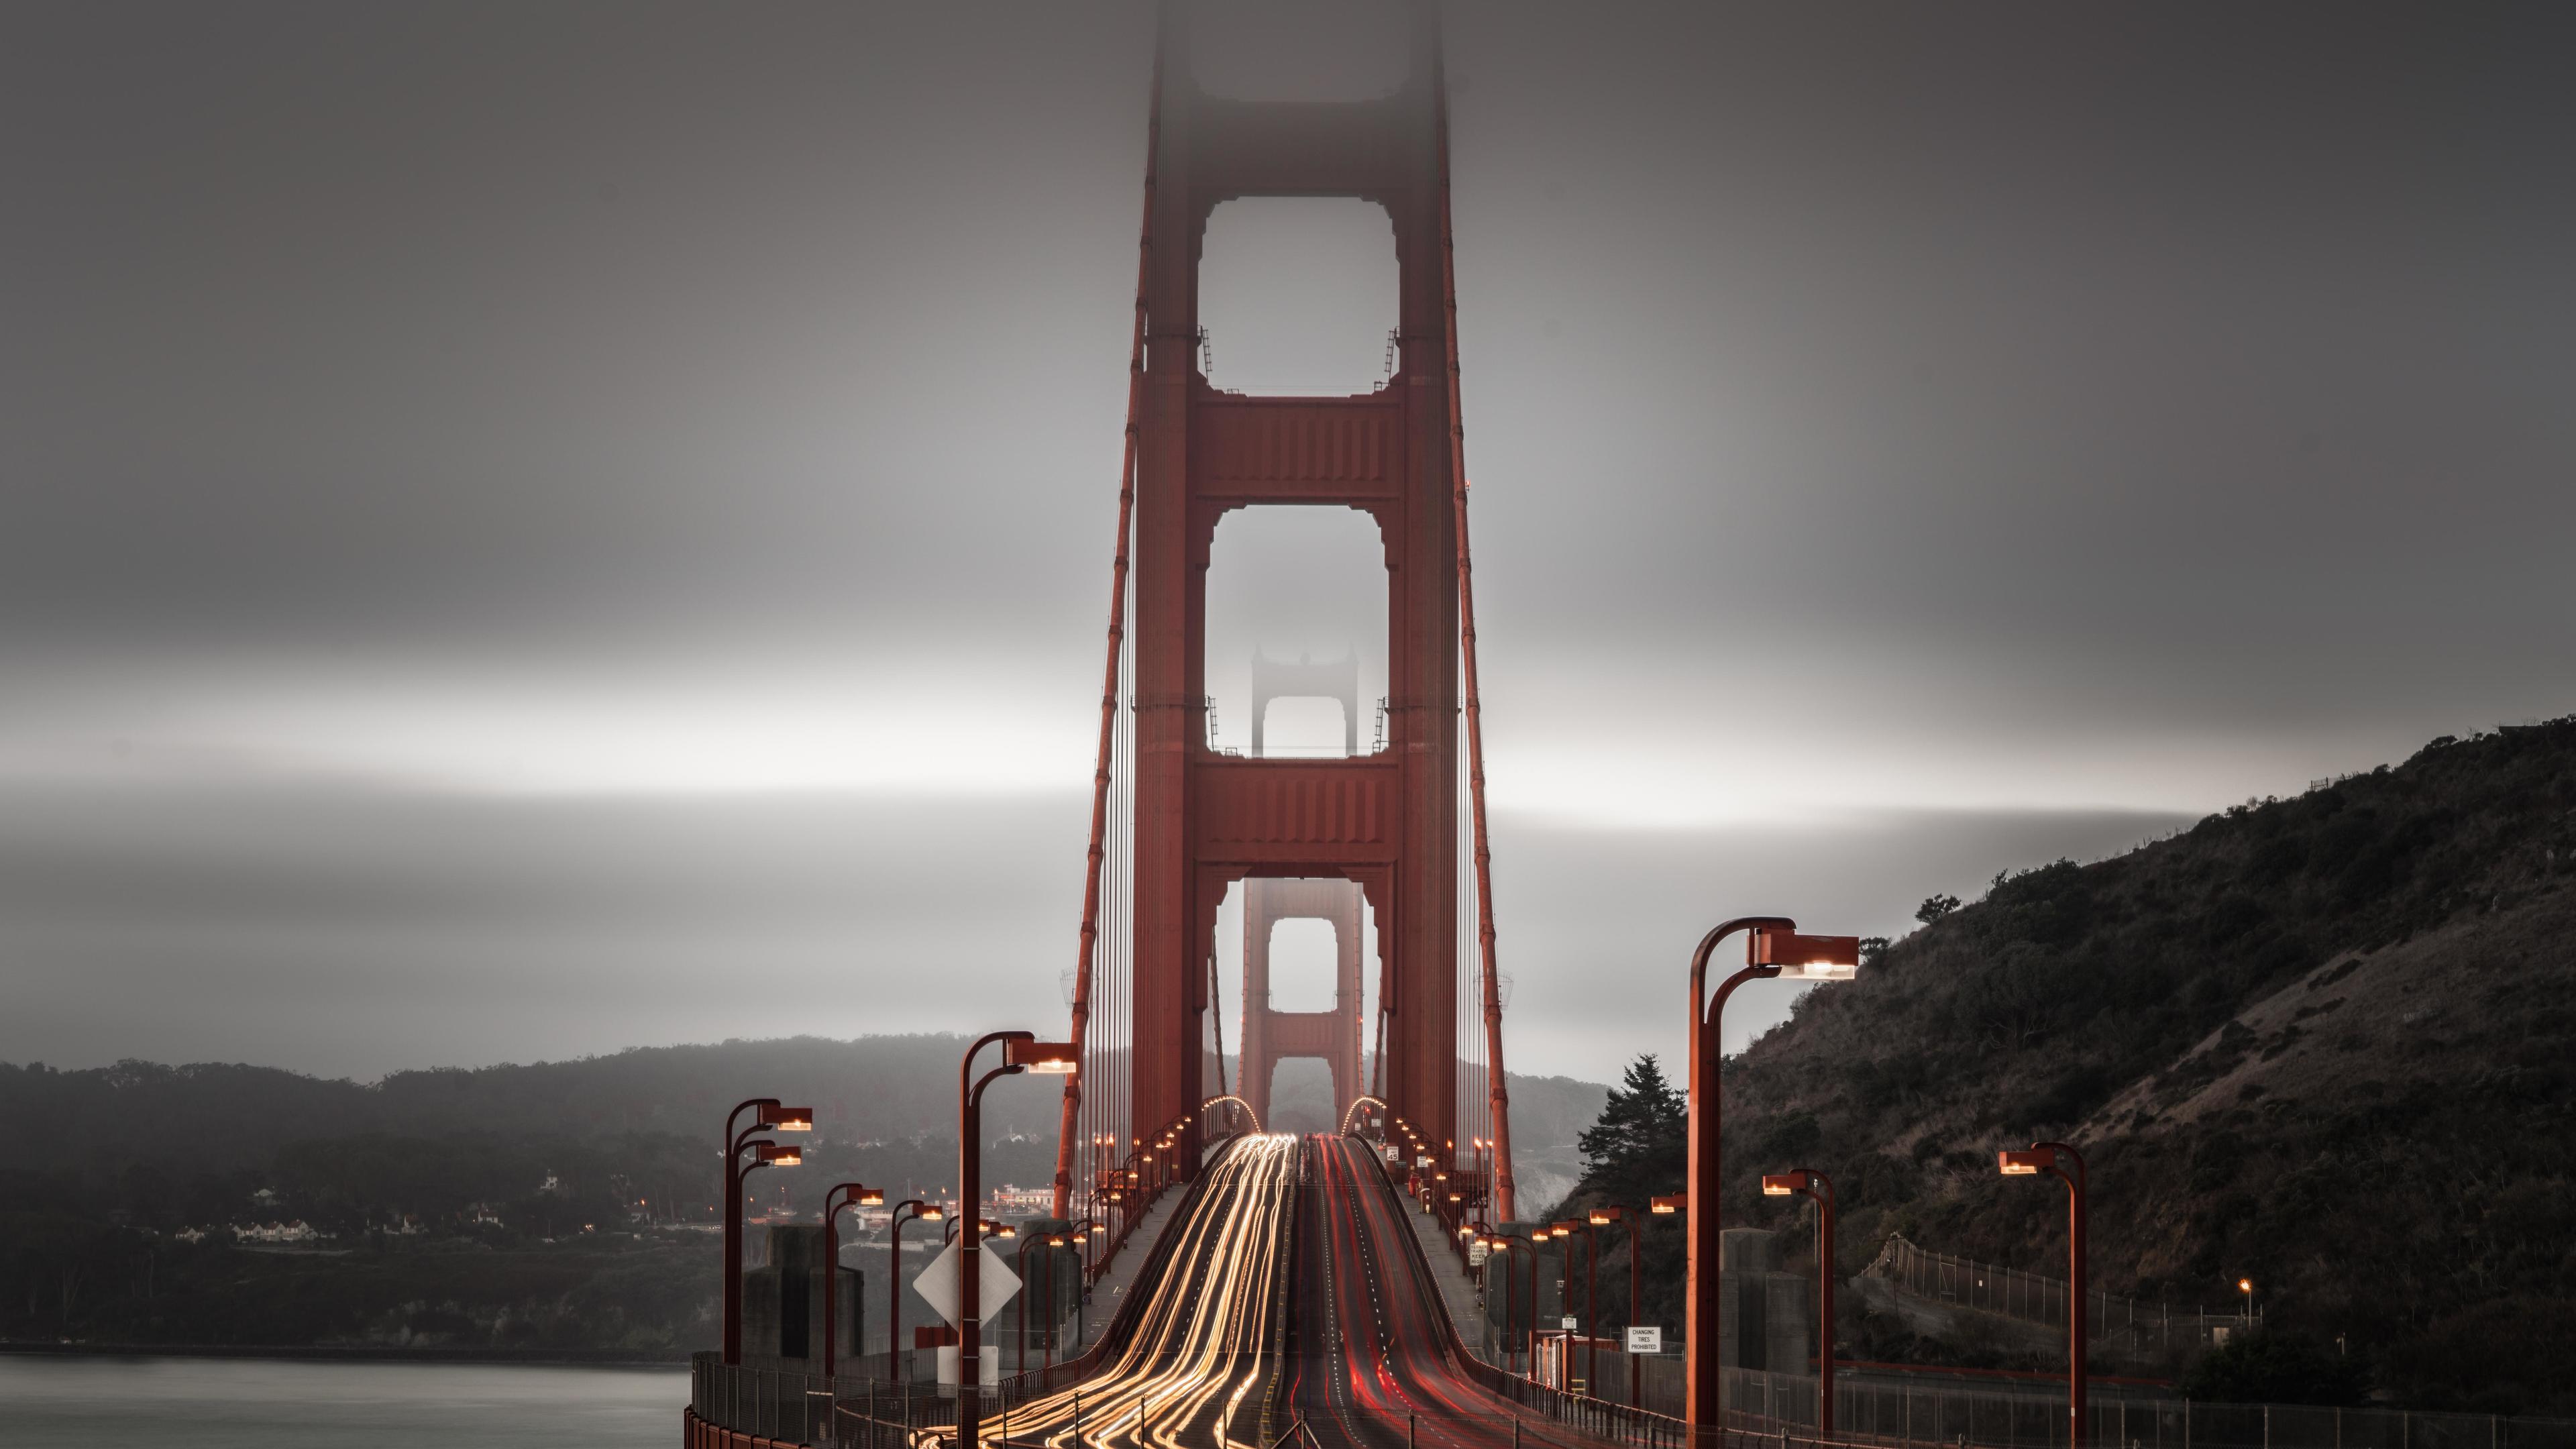 golden gate bridge long exposure 4k 1560535888 - Golden Gate Bridge Long Exposure 4k - world wallpapers, san francisco wallpapers, road wallpapers, hd-wallpapers, golden gate bridge wallpapers, bridge wallpapers, 4k-wallpapers